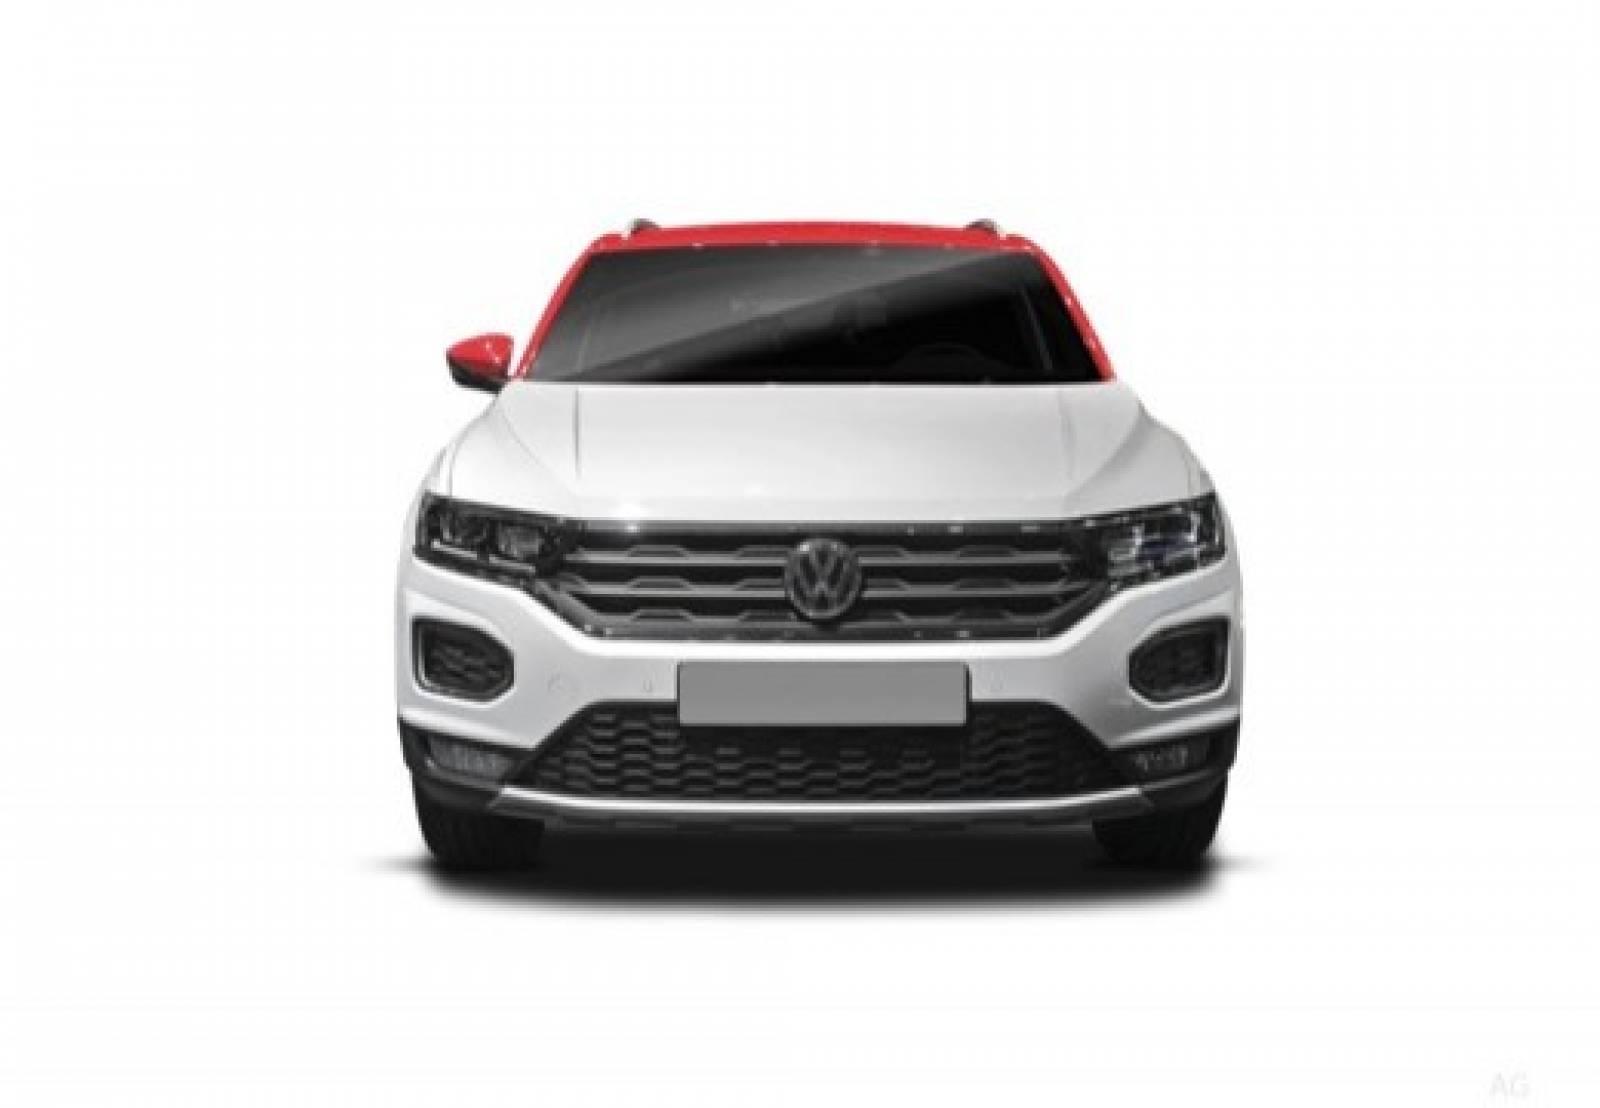 VOLKSWAGEN T-Roc 1.5 TSI 150 EVO Start/Stop DSG7 - véhicule neuf - LEMAUVIEL AUTOMOBILES - Présentation site web V2 - Lemauviel Automobiles - VIRE - 14500 - VIRE - 3